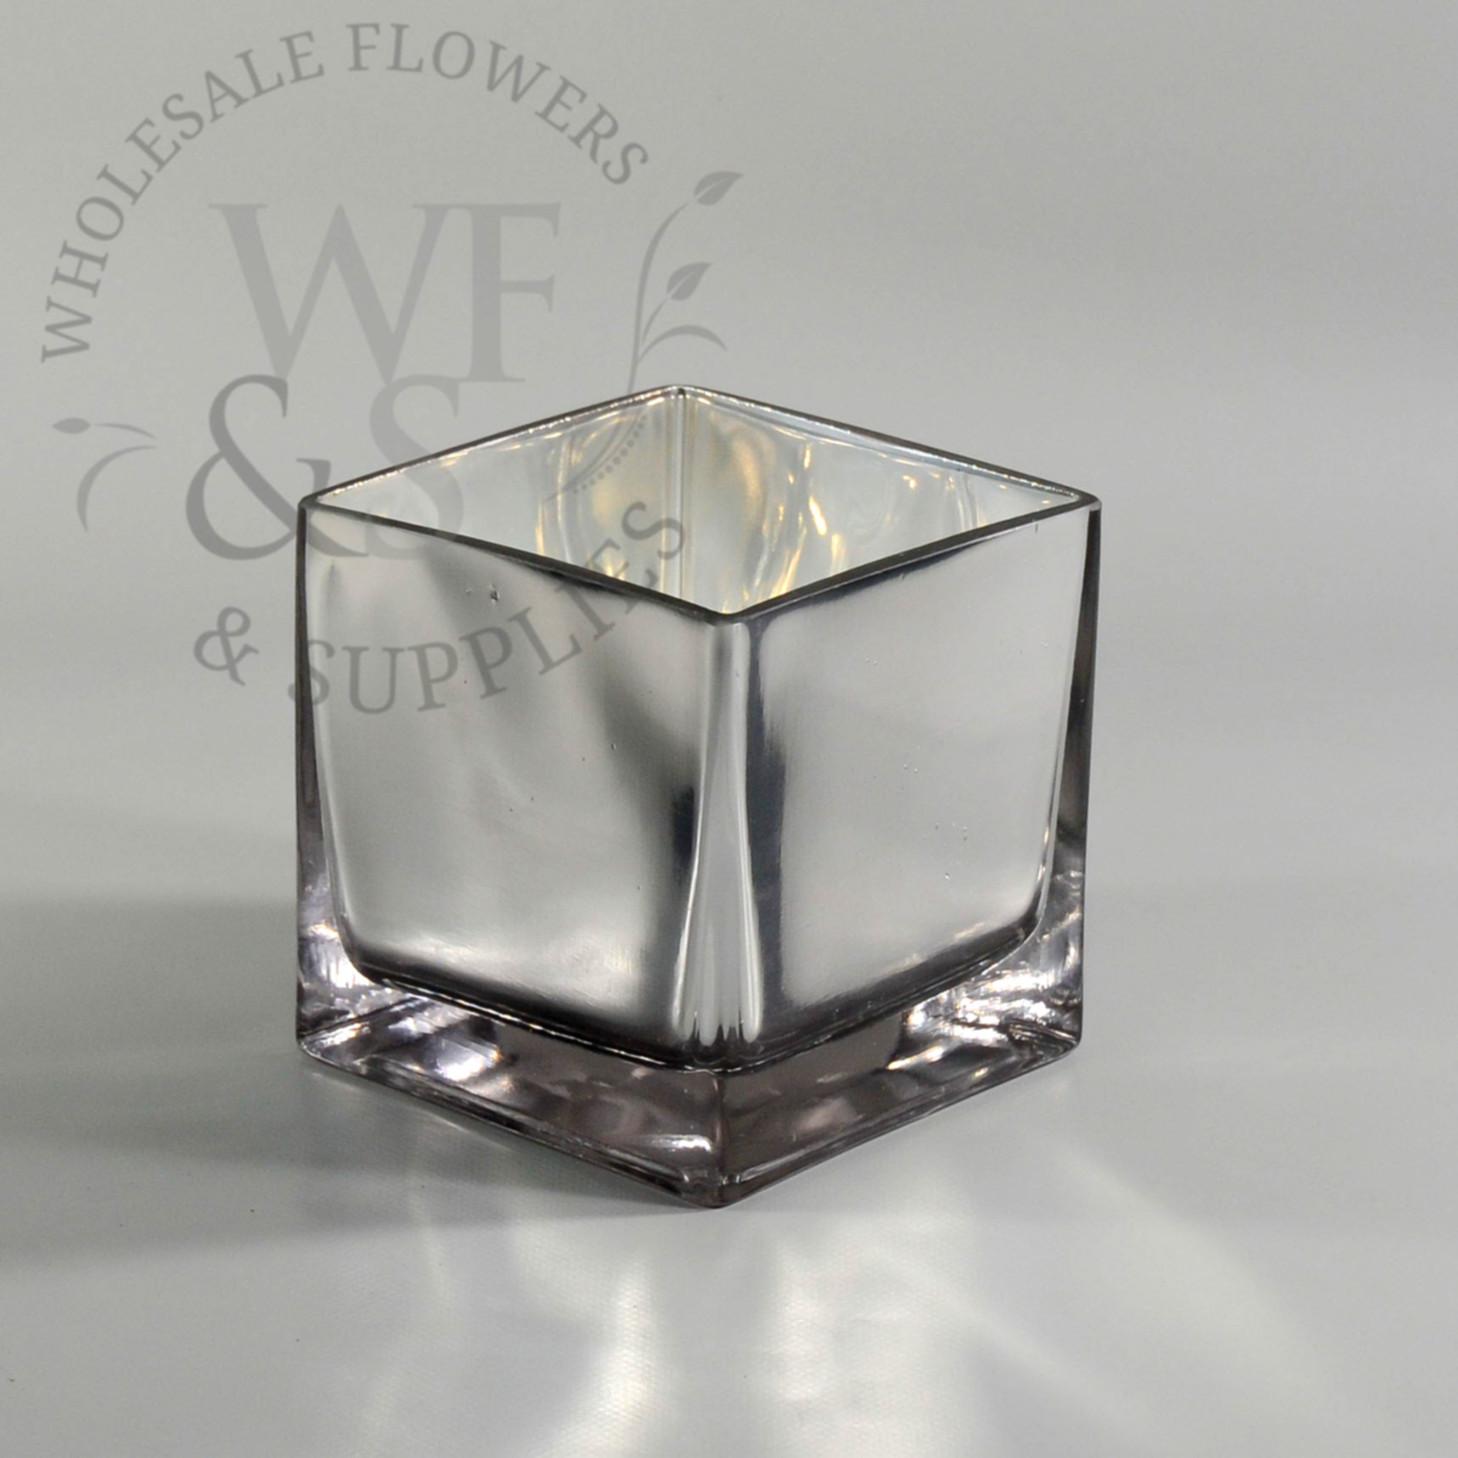 6 square vase of square vases 6″ set of 12 abc glassware square glass vases with square vases 6″ set of 12 abc glassware square glass vases pictures